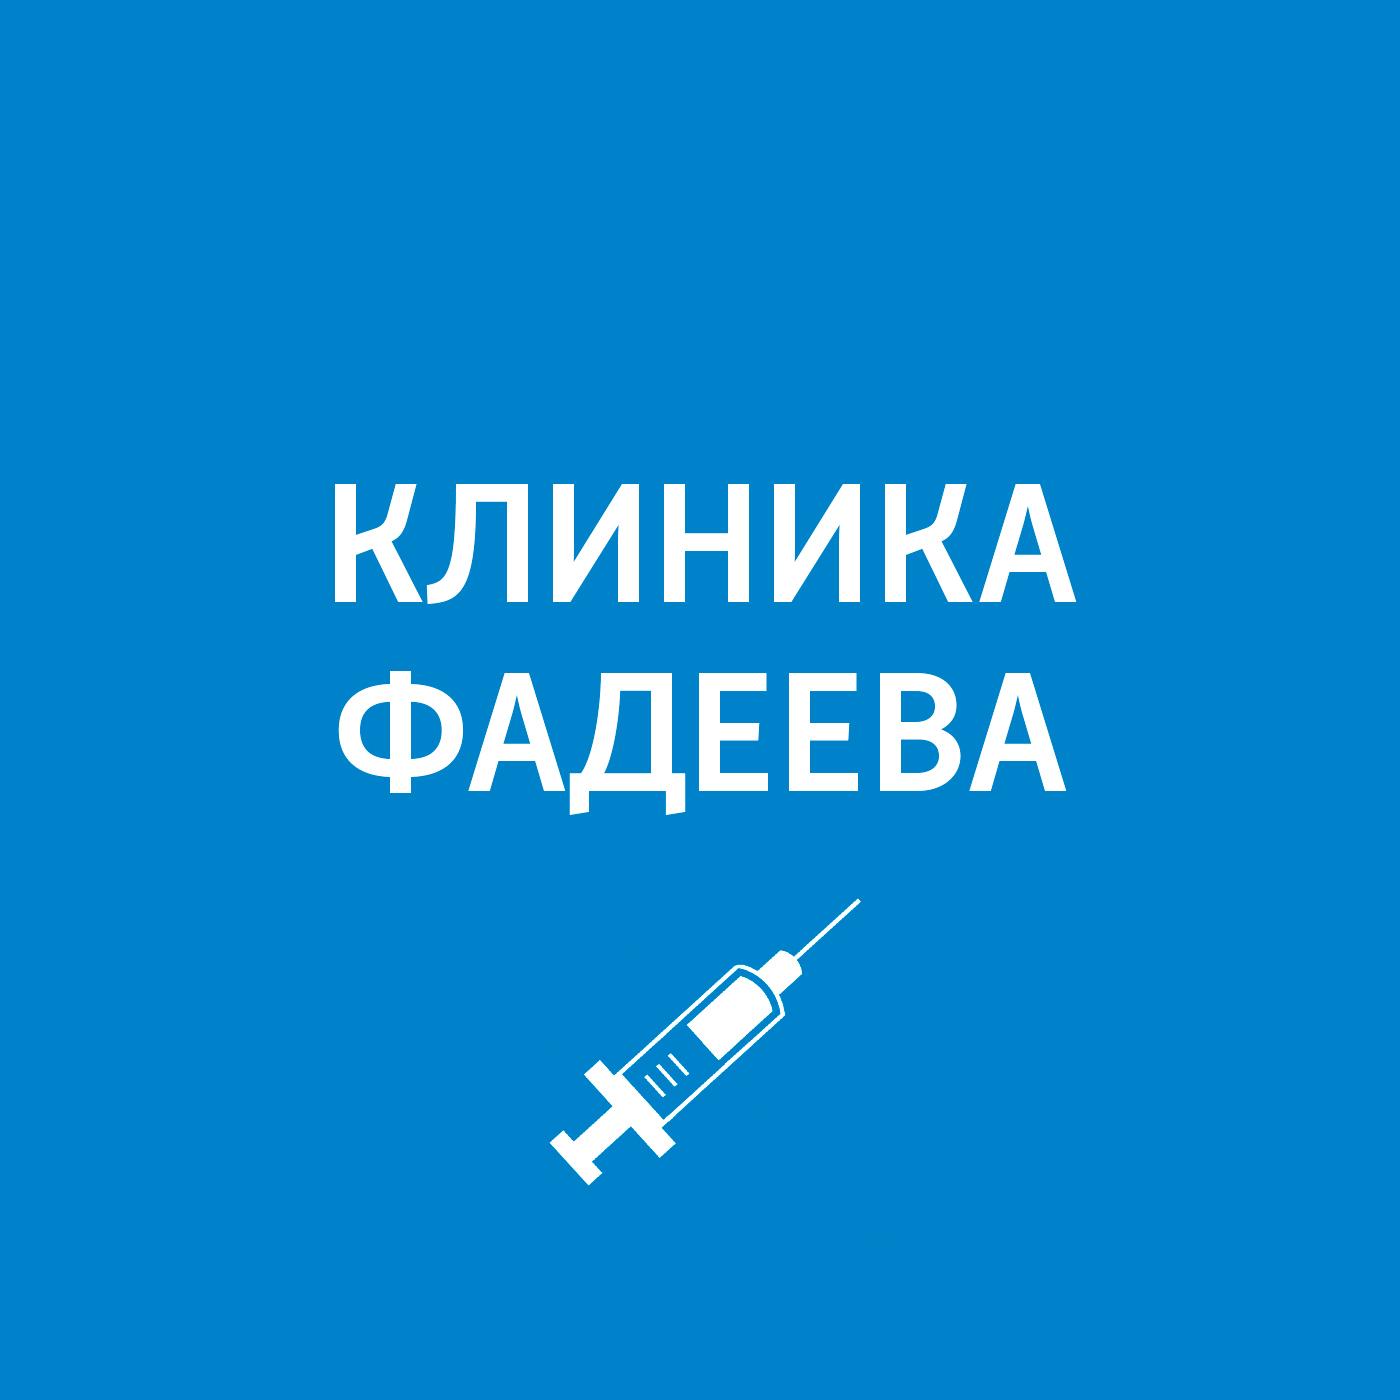 Пётр Фадеев Crossfit